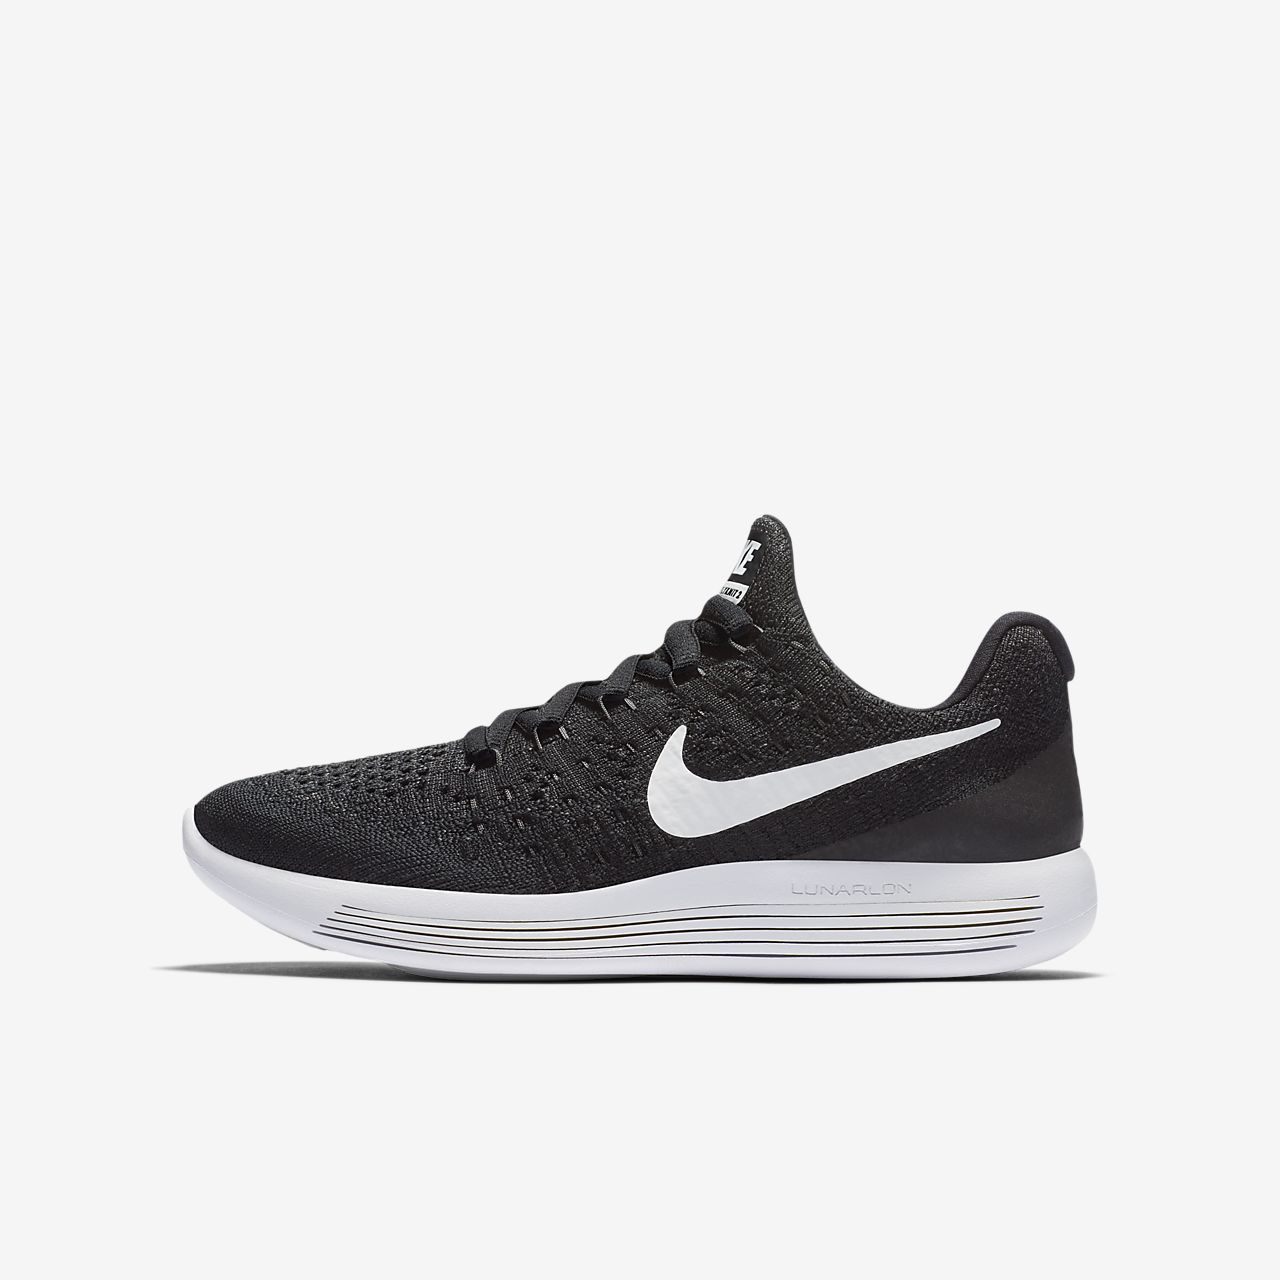 Nike LunarEpic Low Flyknit 2 Kids Running Shoes Black/Anthracite/White